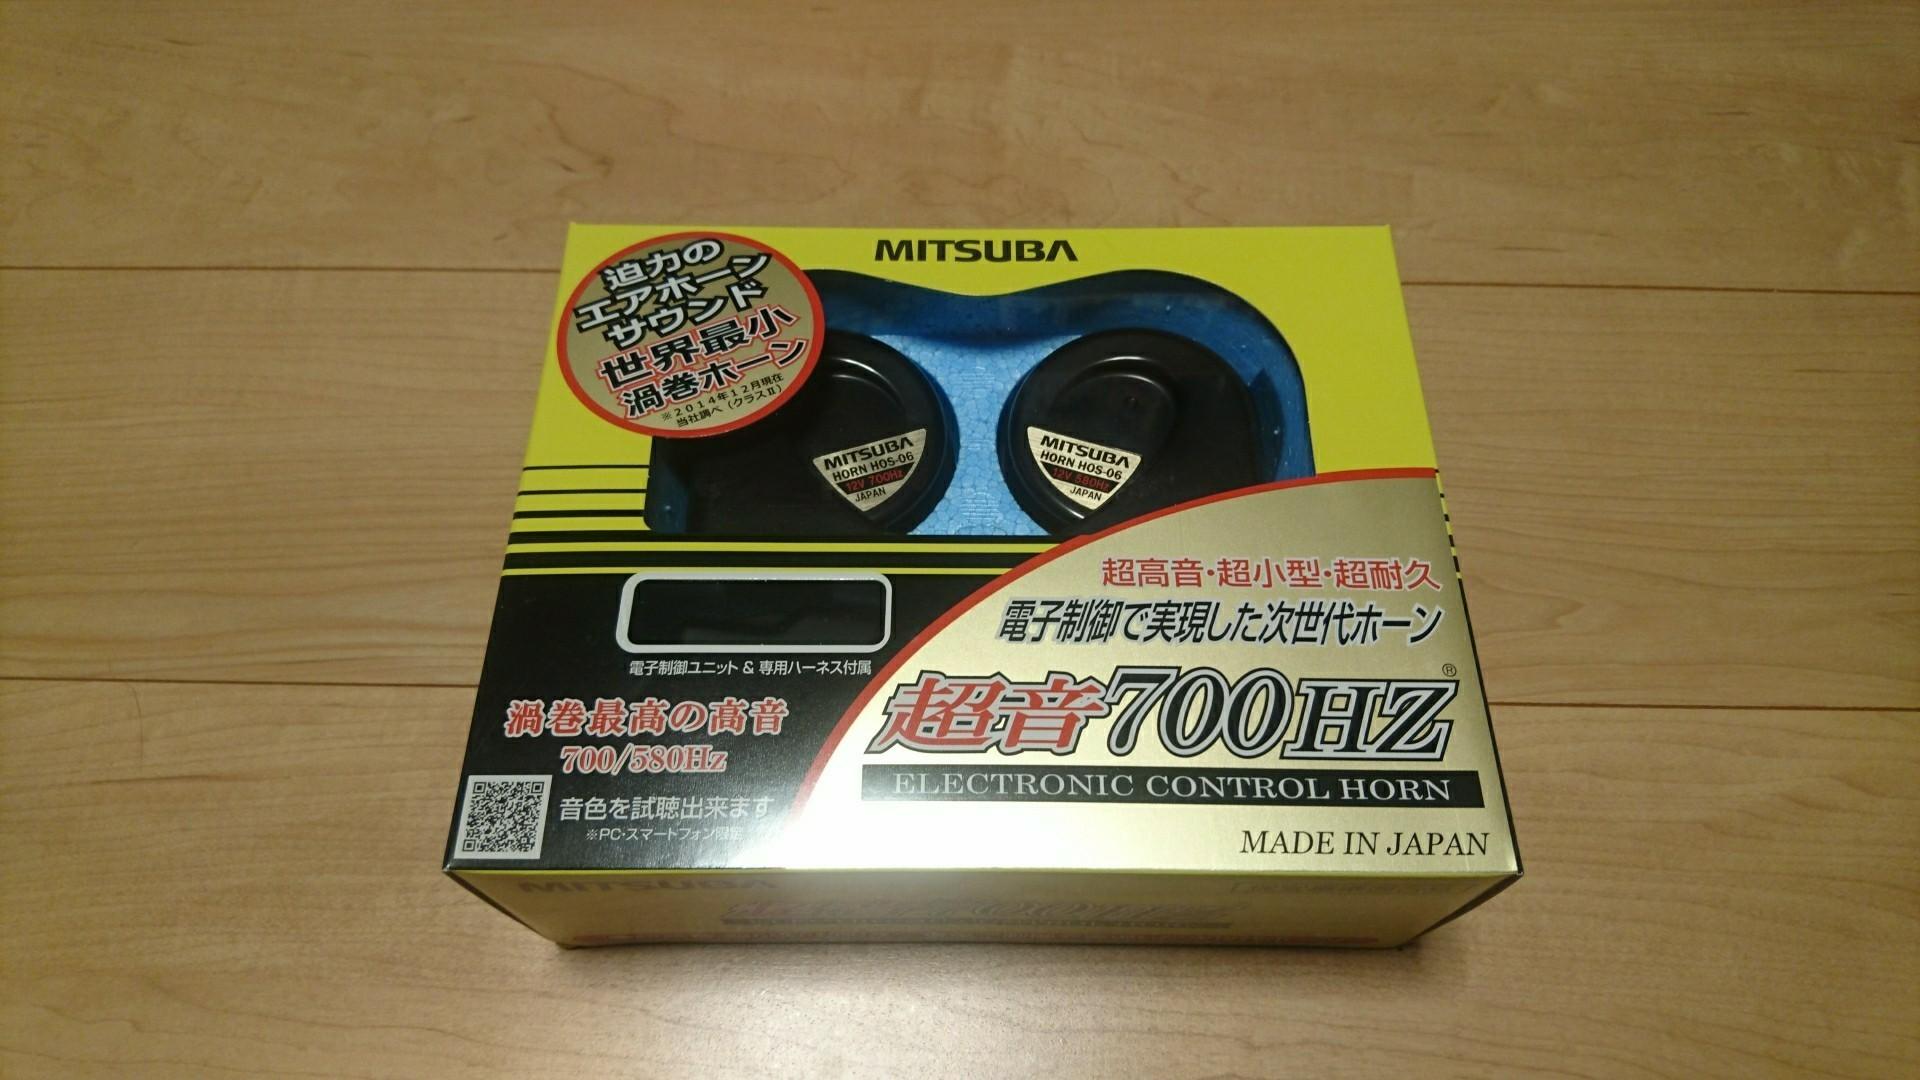 MITSUBAの超音700HZホーン取り付け